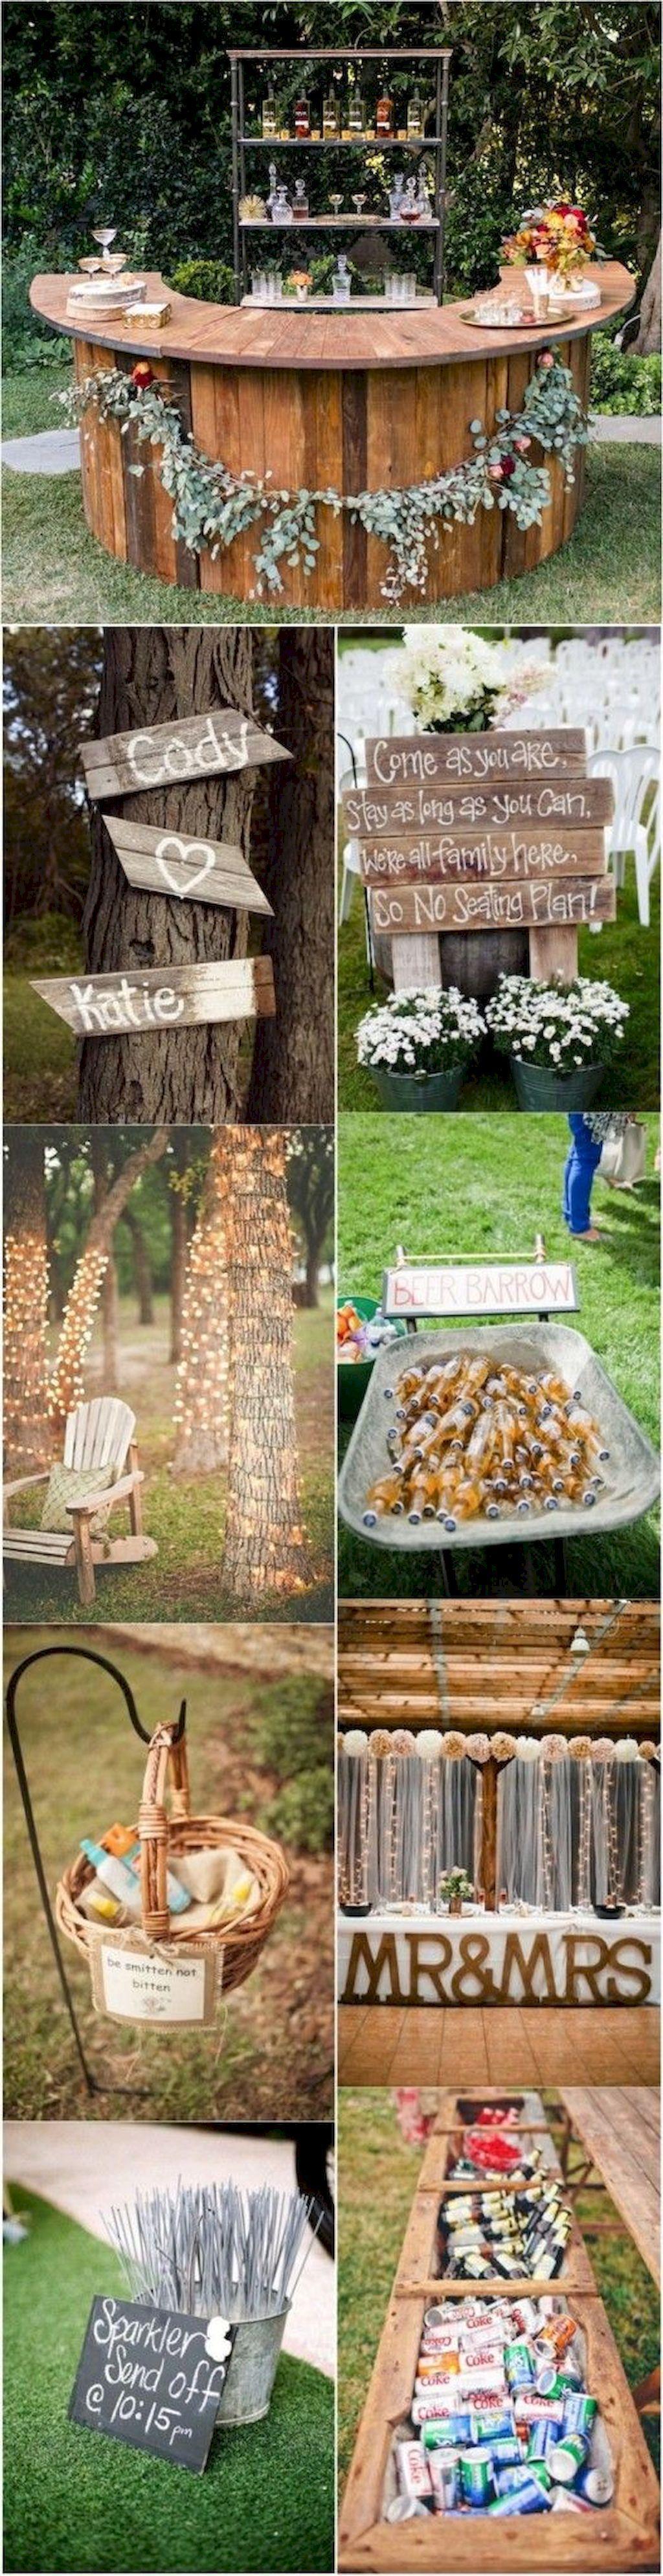 Elegant outdoor wedding decor ideas on a budget